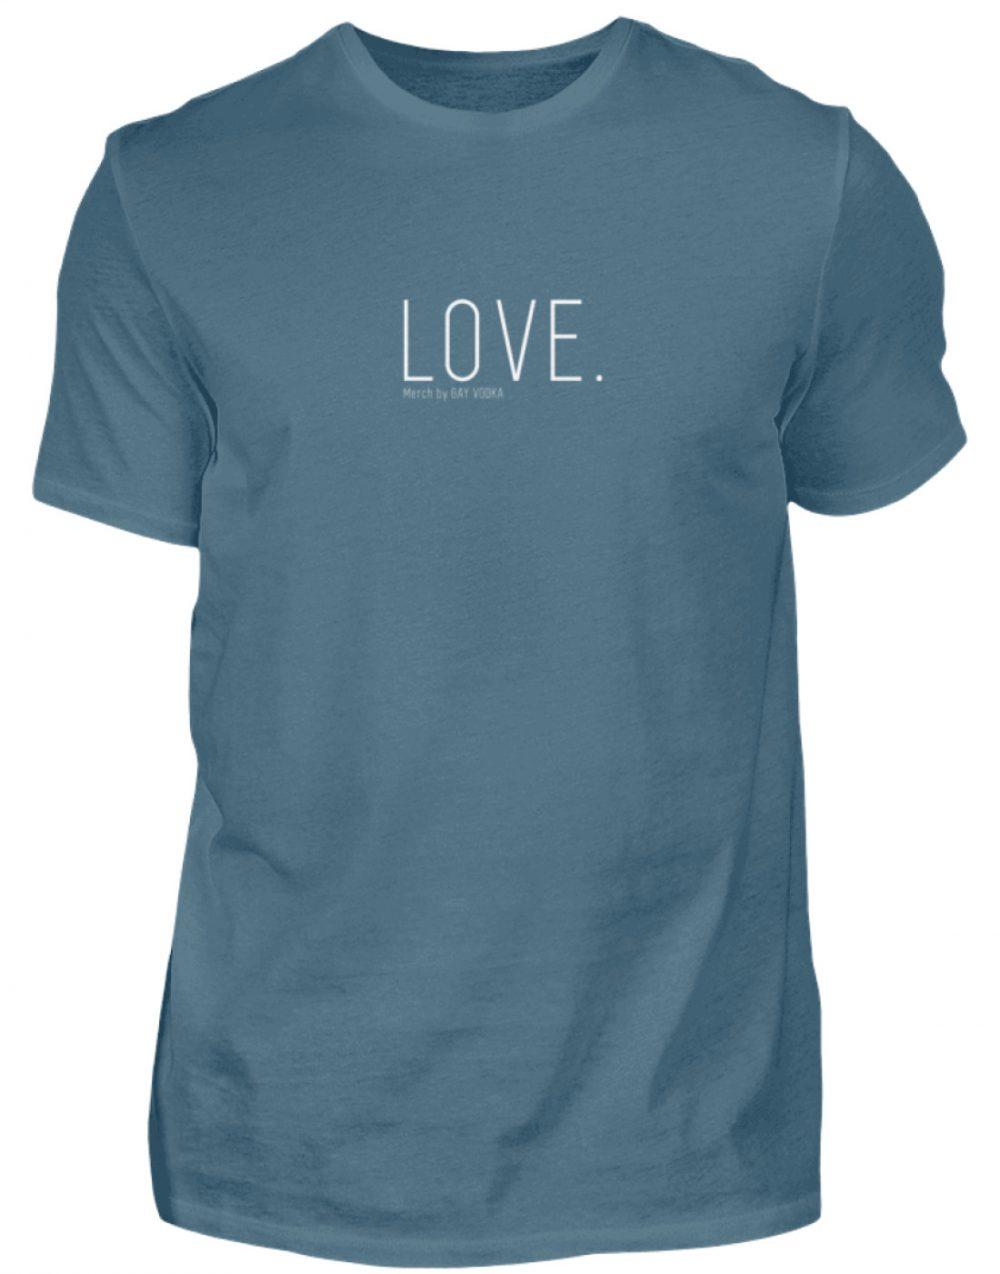 LOVE. - Herren Shirt-1230